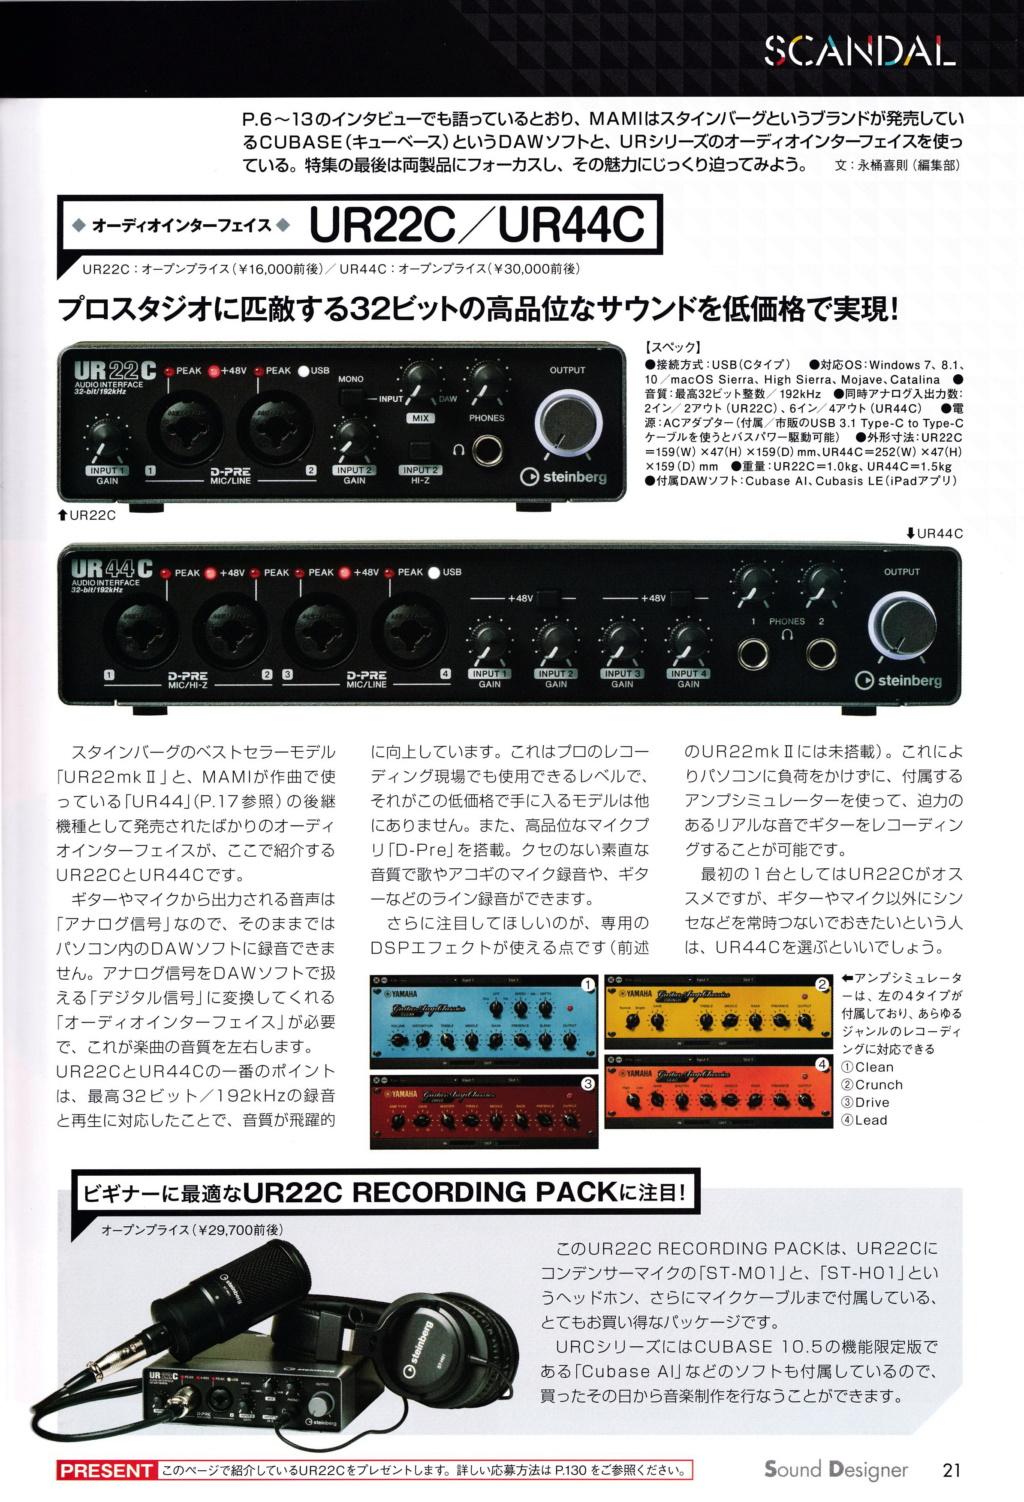 SOUND DESIGNER Img_0048